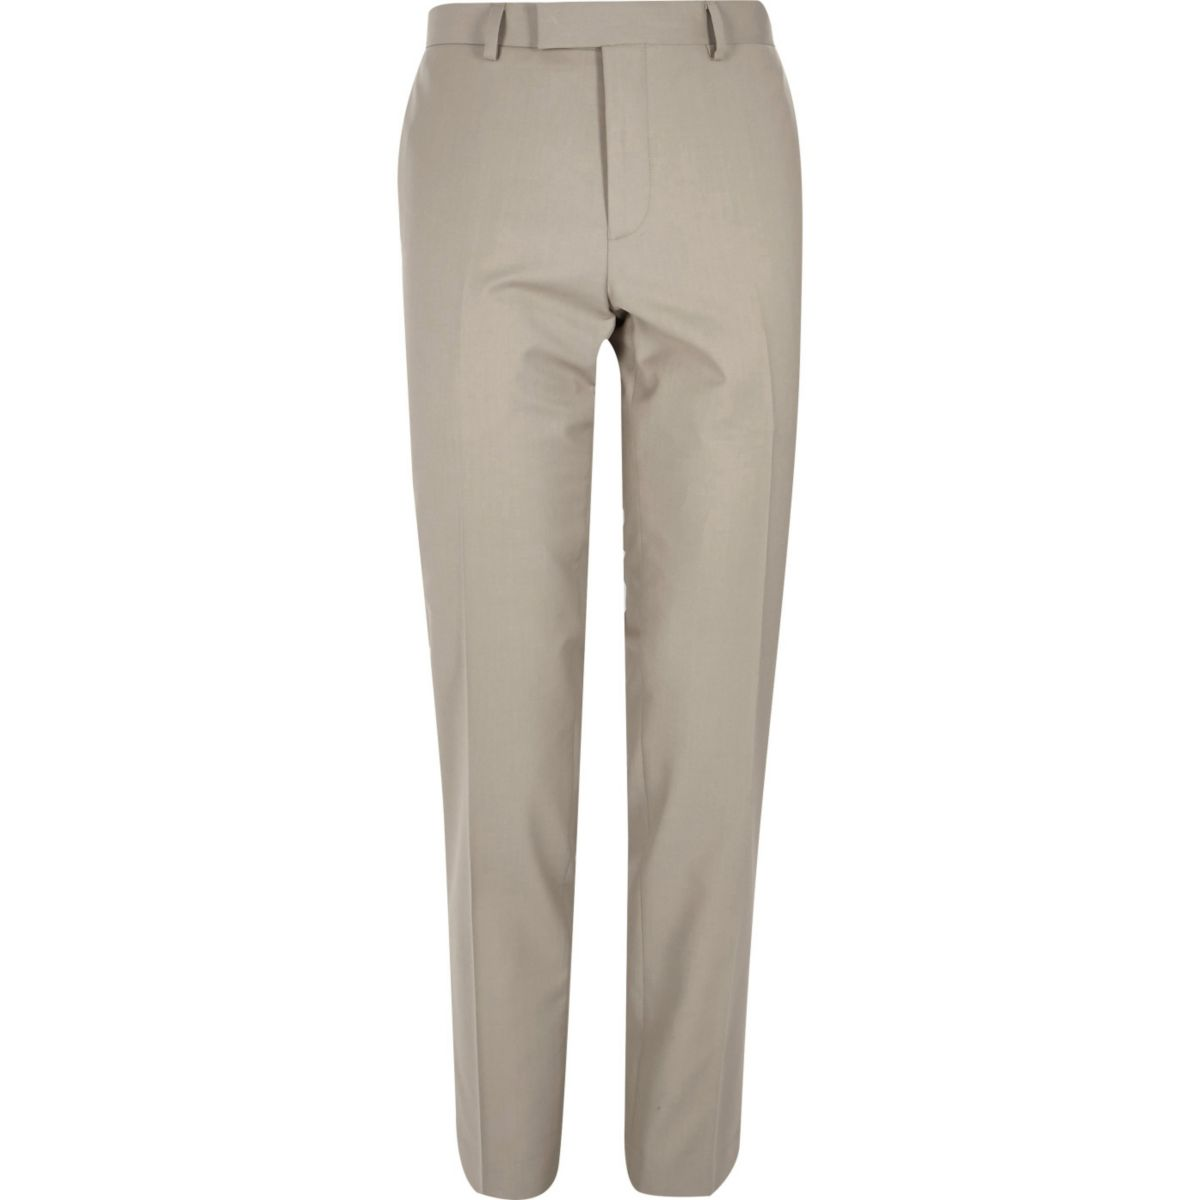 Beige skinny-fit pantalon